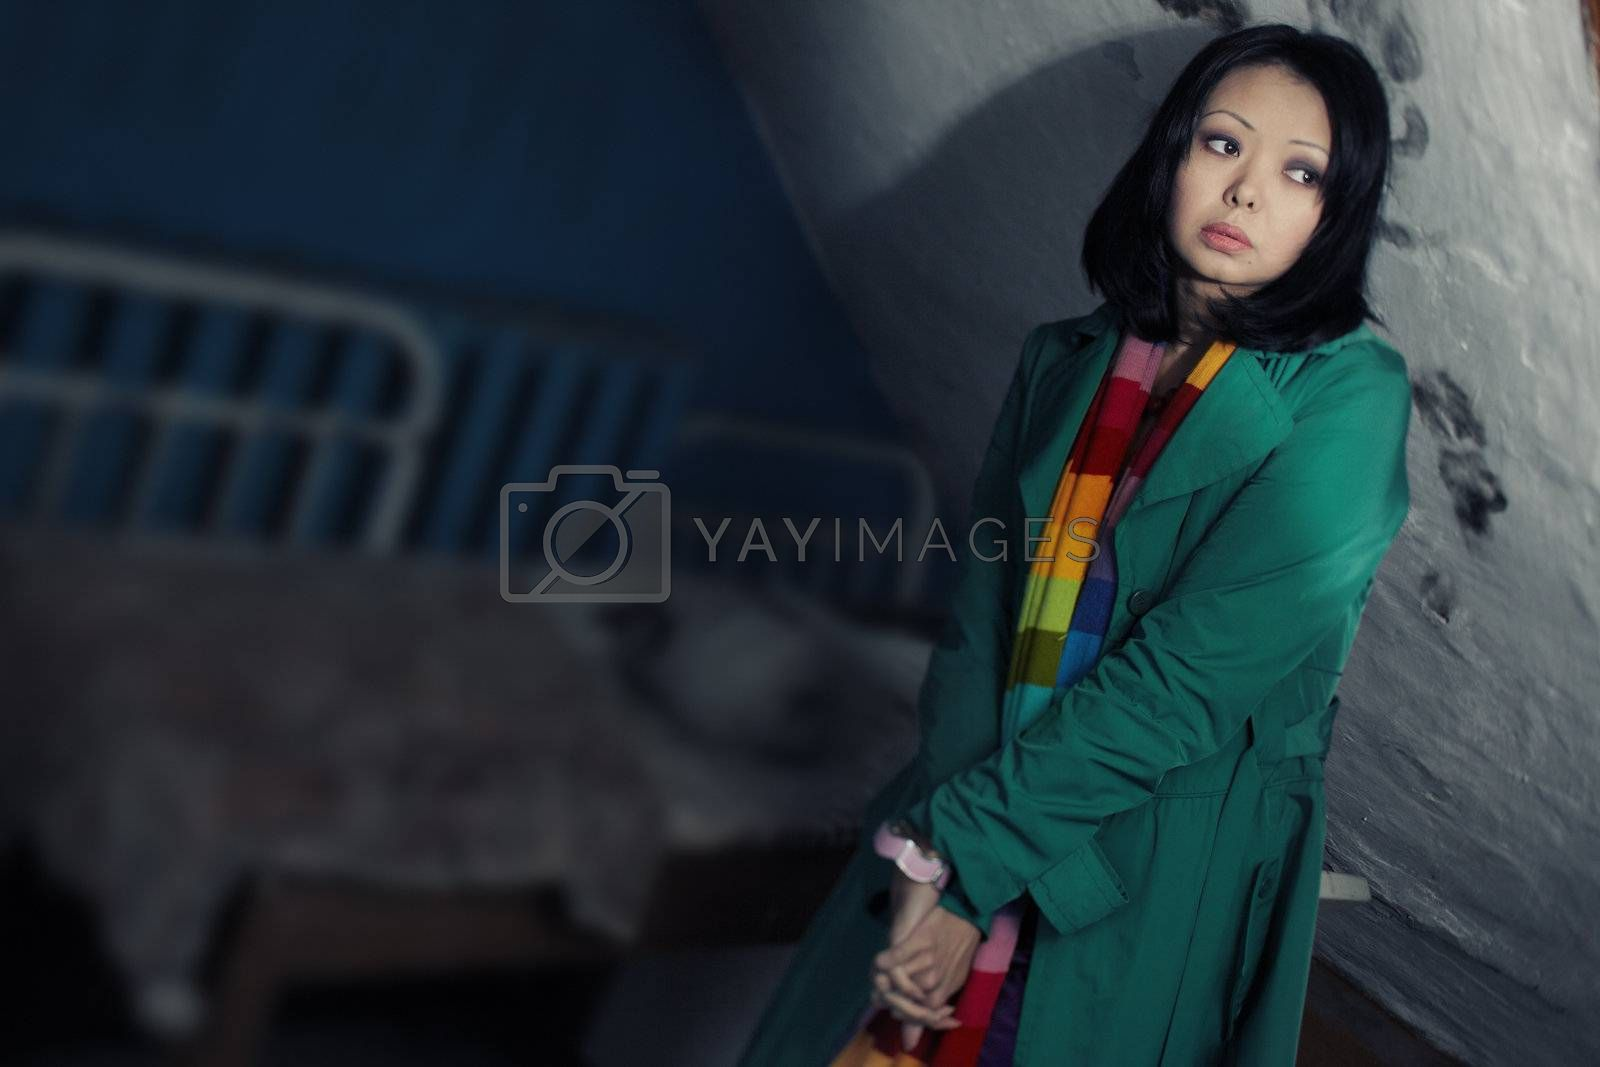 Sad stylish woman indoors. Special defocus effect taken from tilt-shift lens